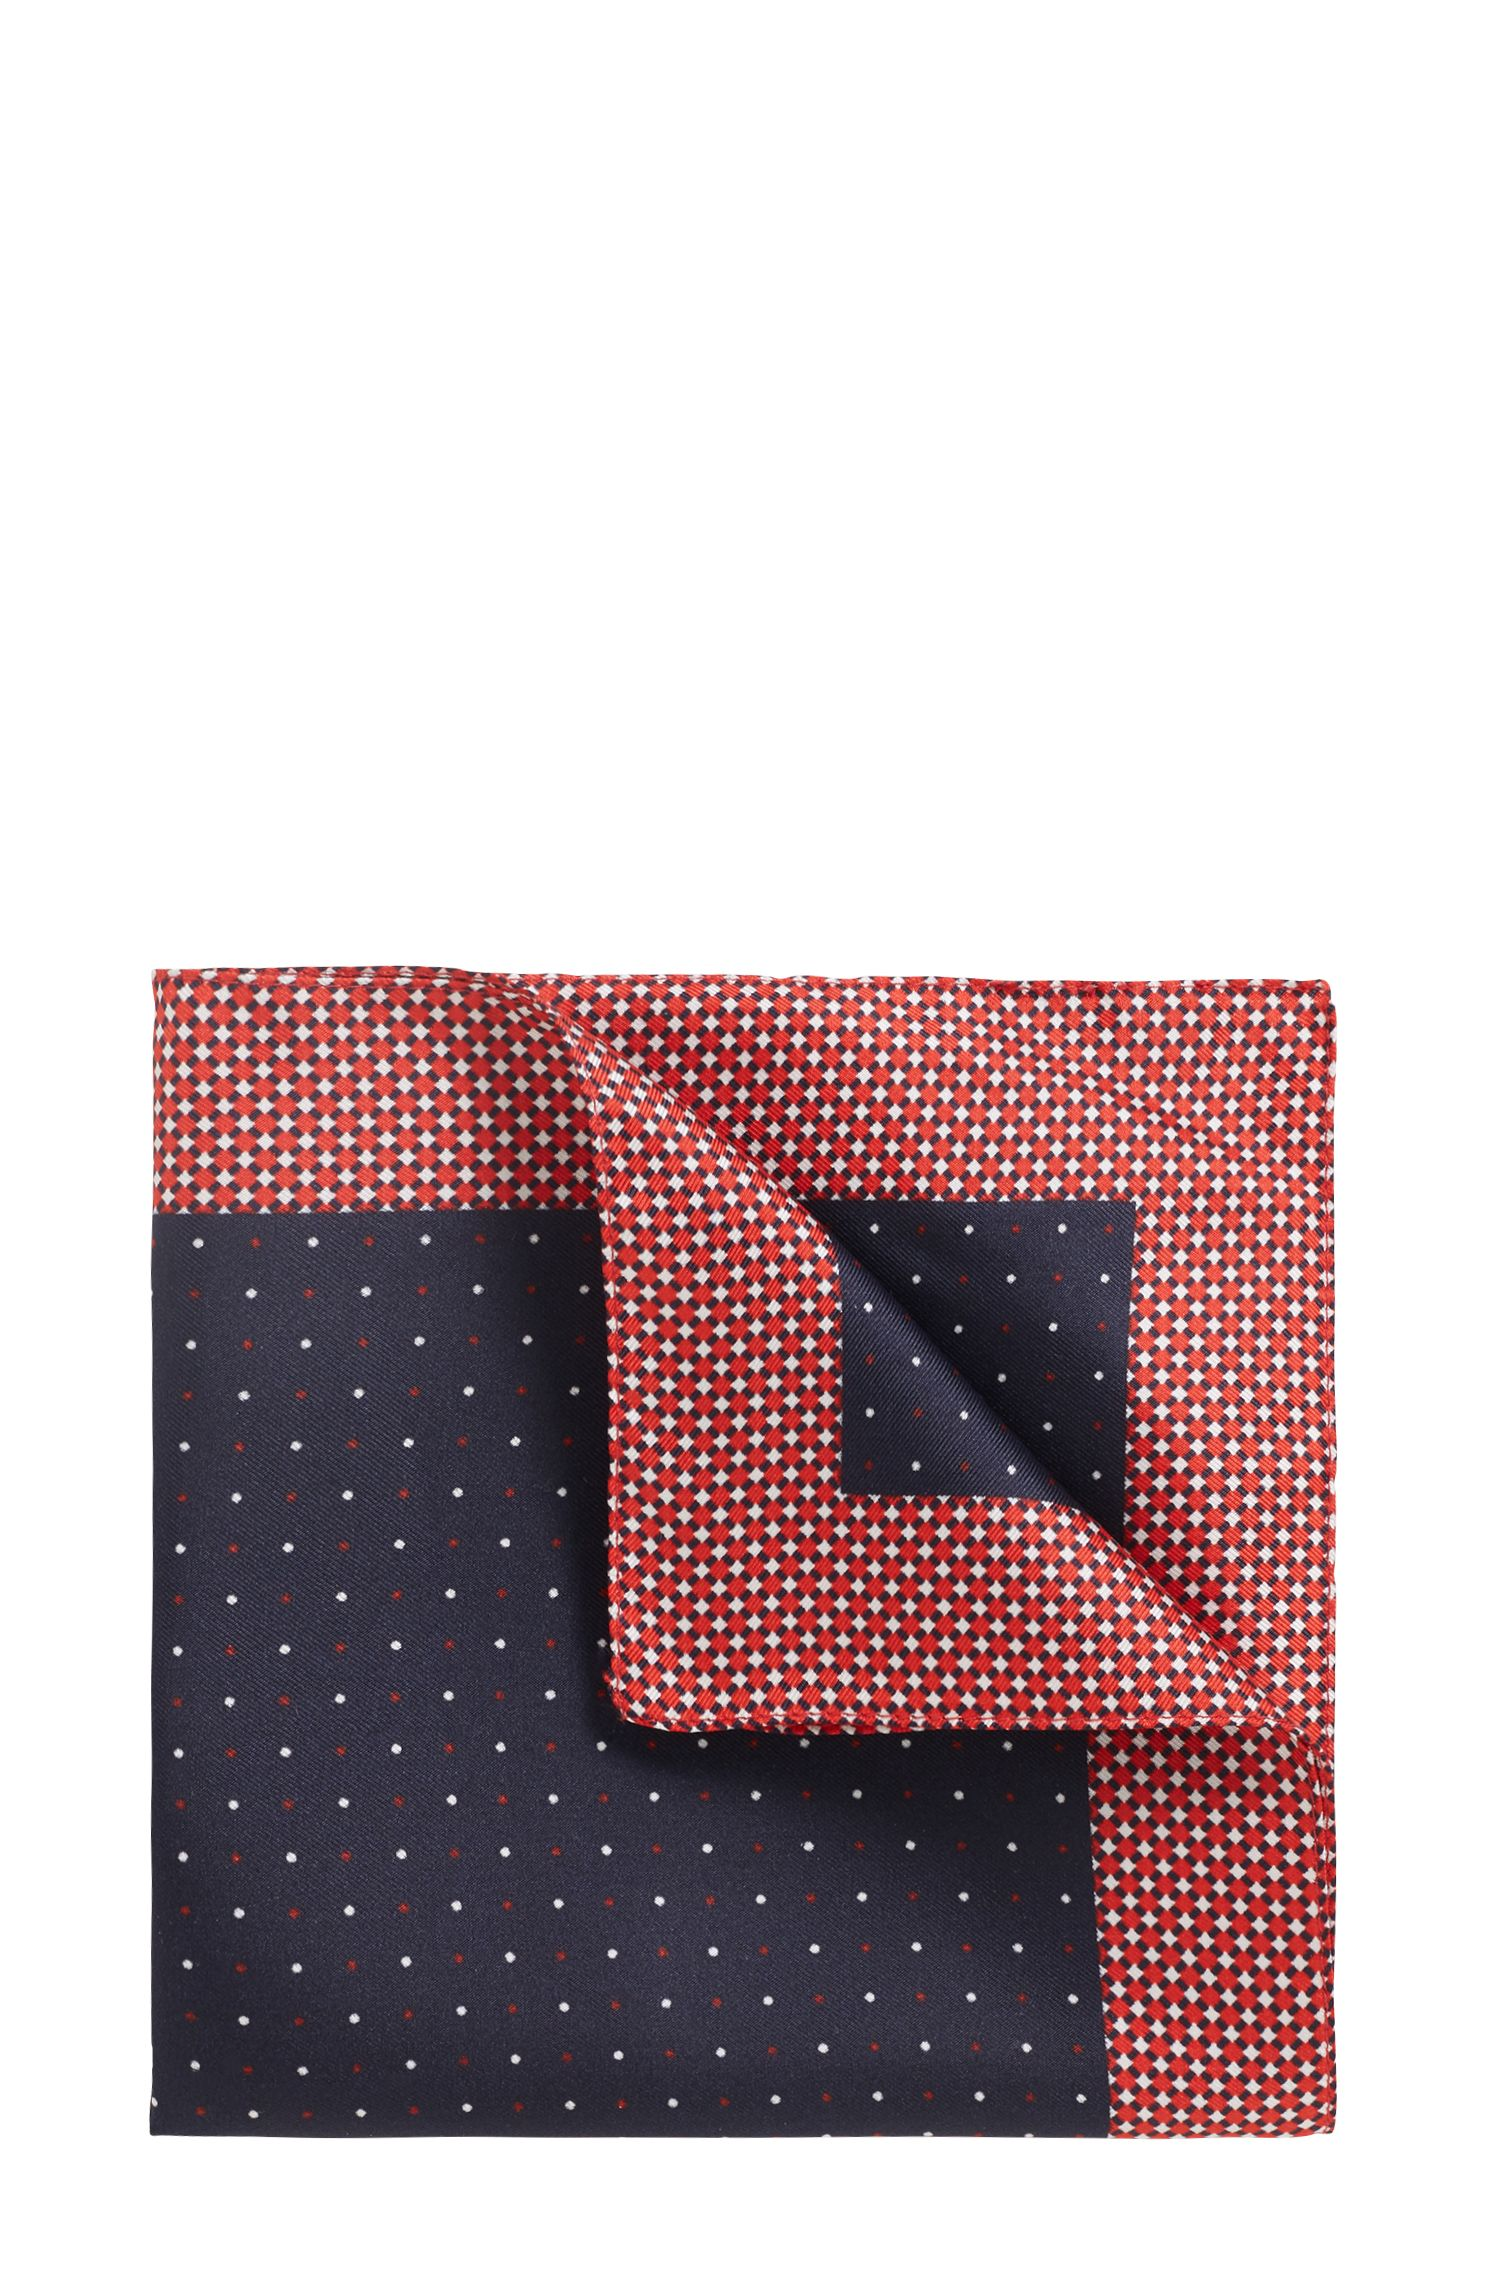 Travel Line-pochet in waterafstotende zijde, Rood